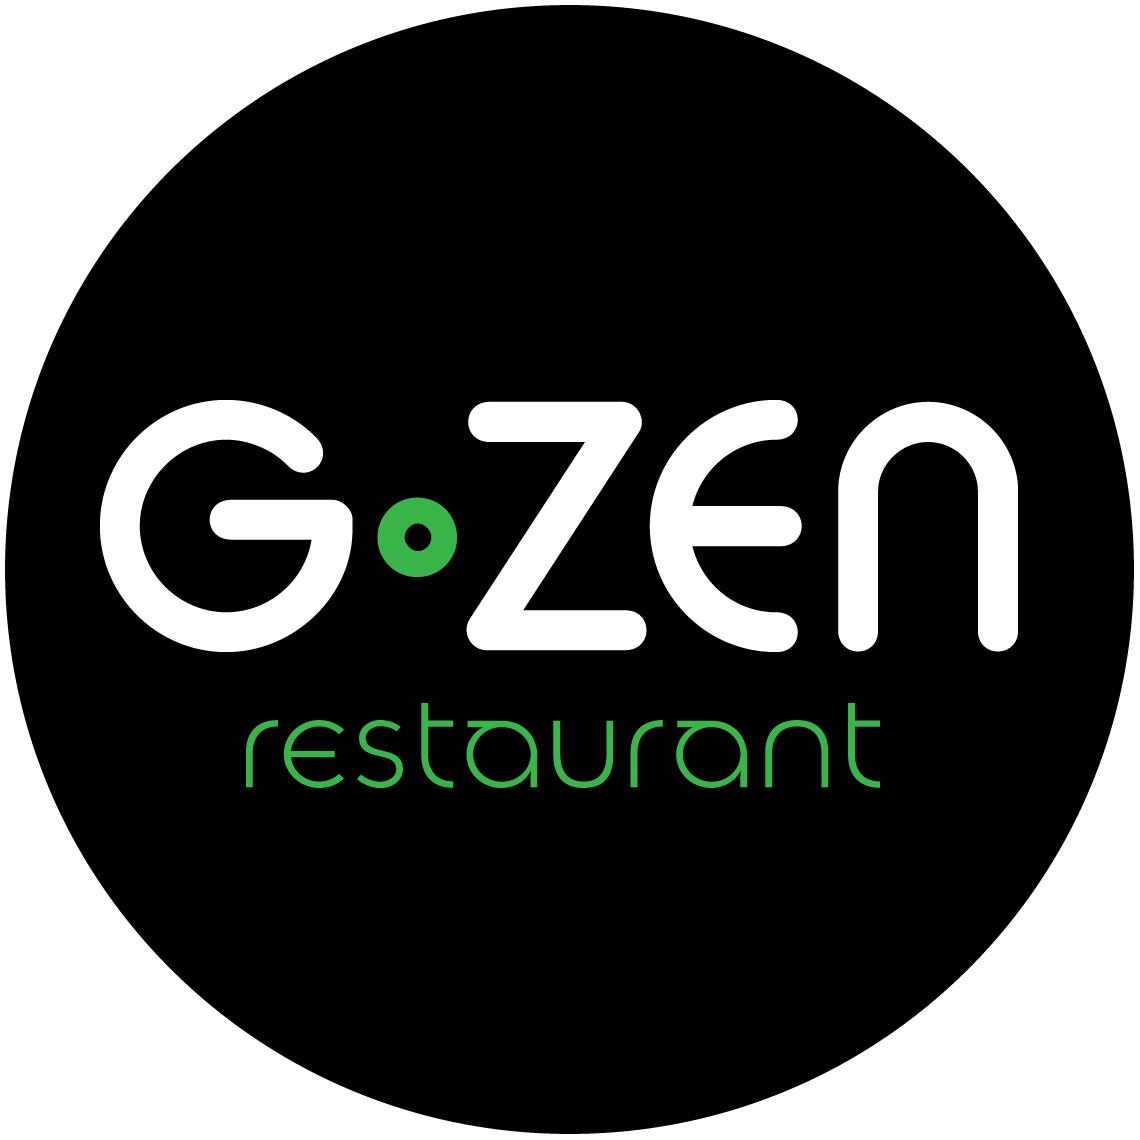 GZEN_rest_logo copy.jpg